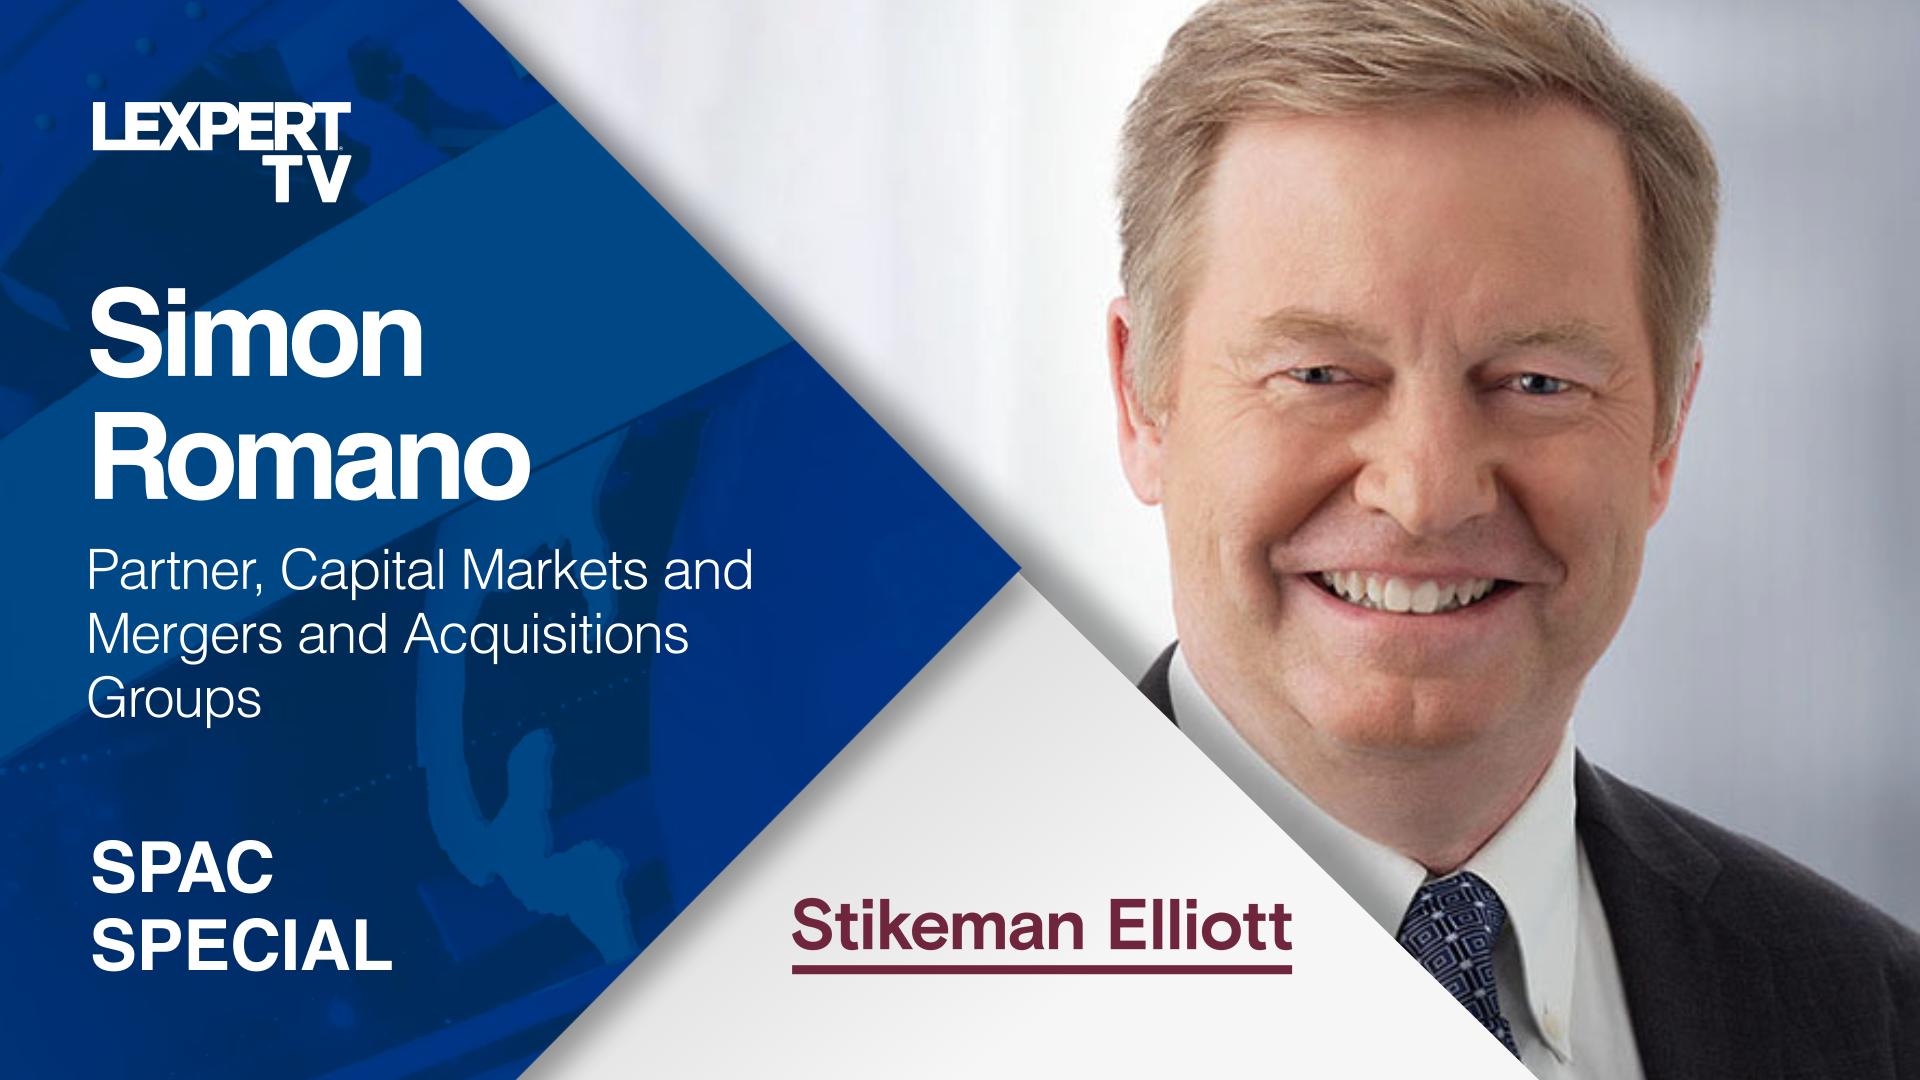 Simon Romano: SPACS, the latest investment trend and Stikeman Elliott LLP's involvement